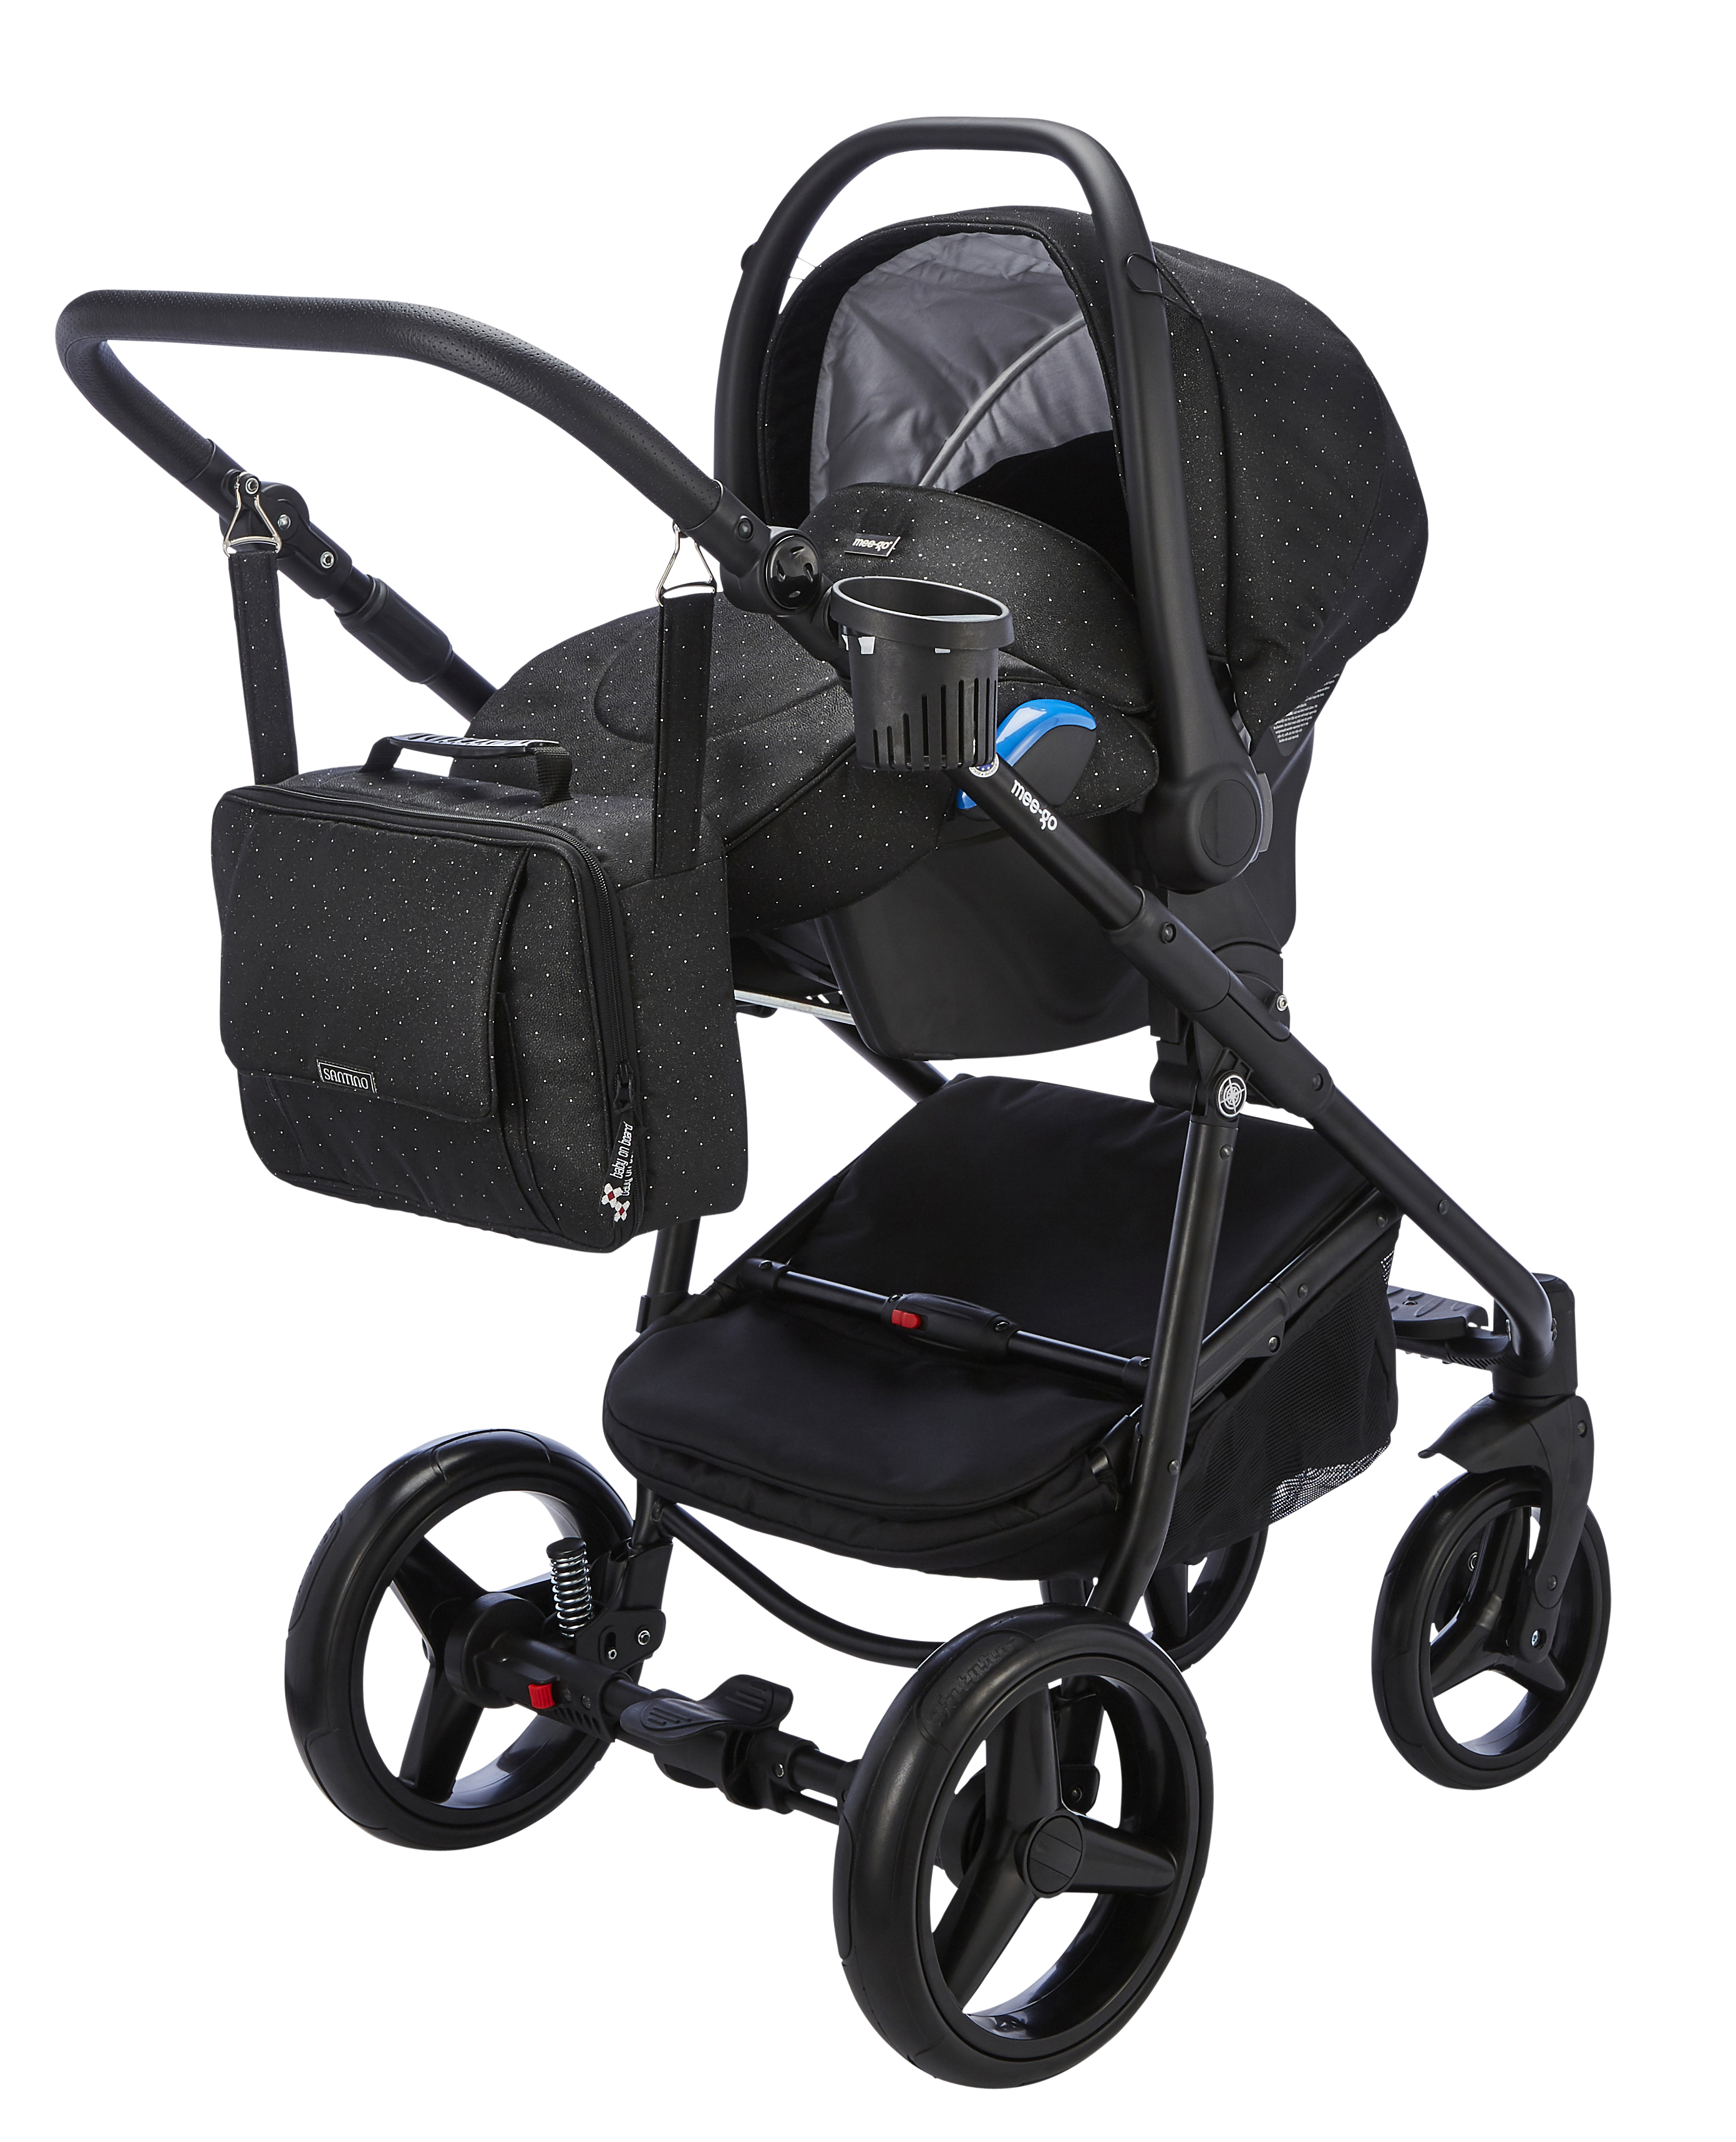 mee-go santino galaxy car seat